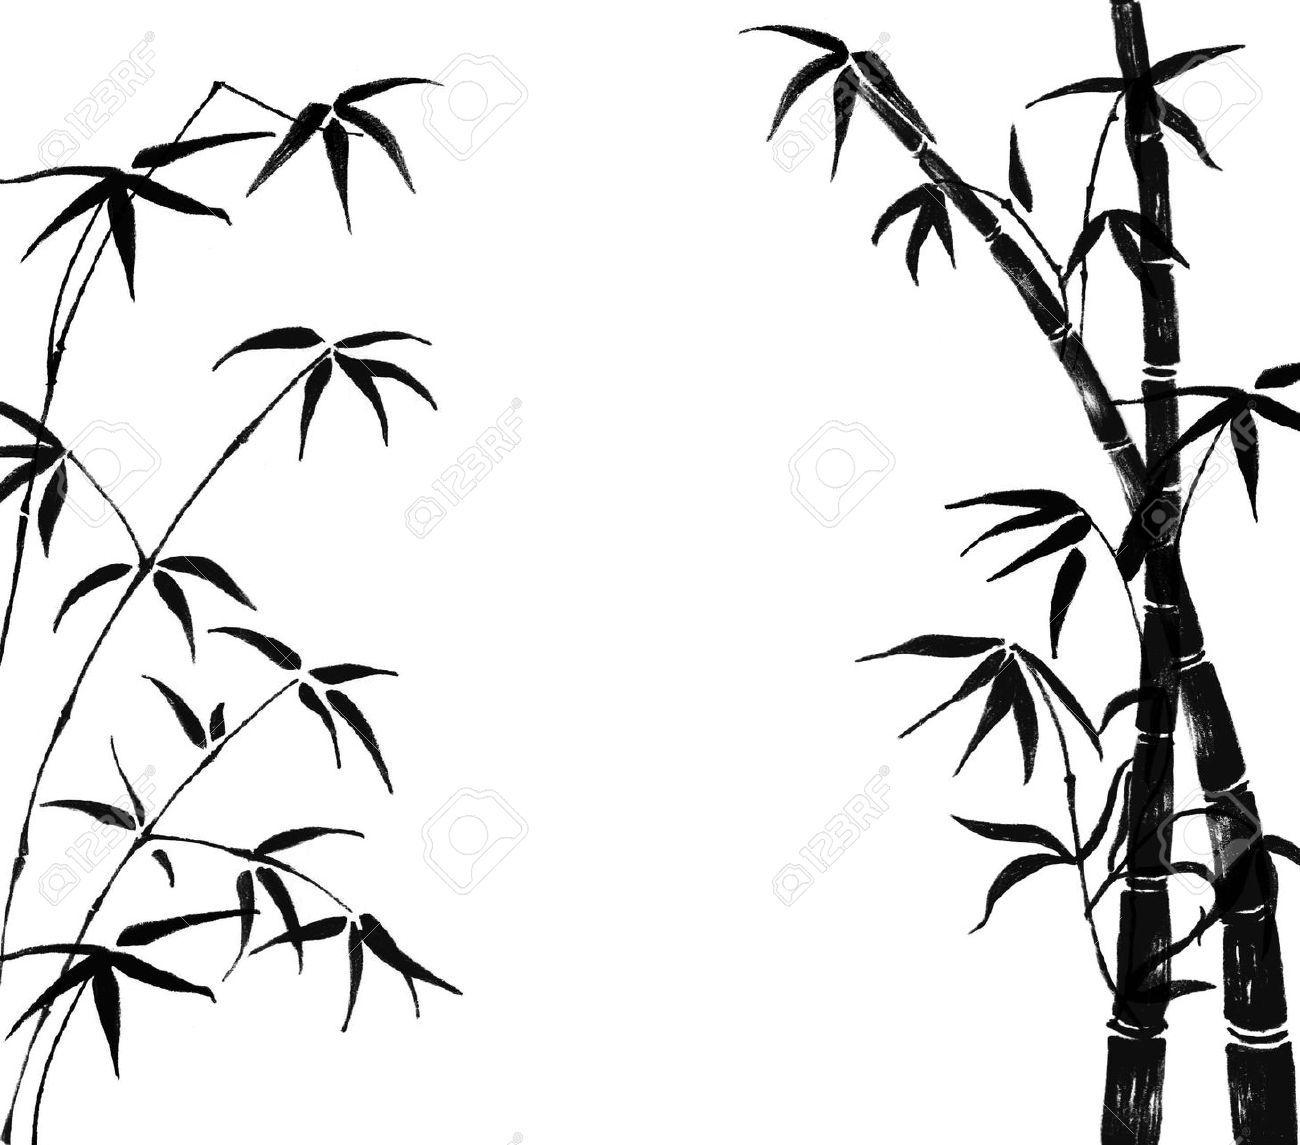 pin by kyle milligan on kaikai coconut bamboo bamboo